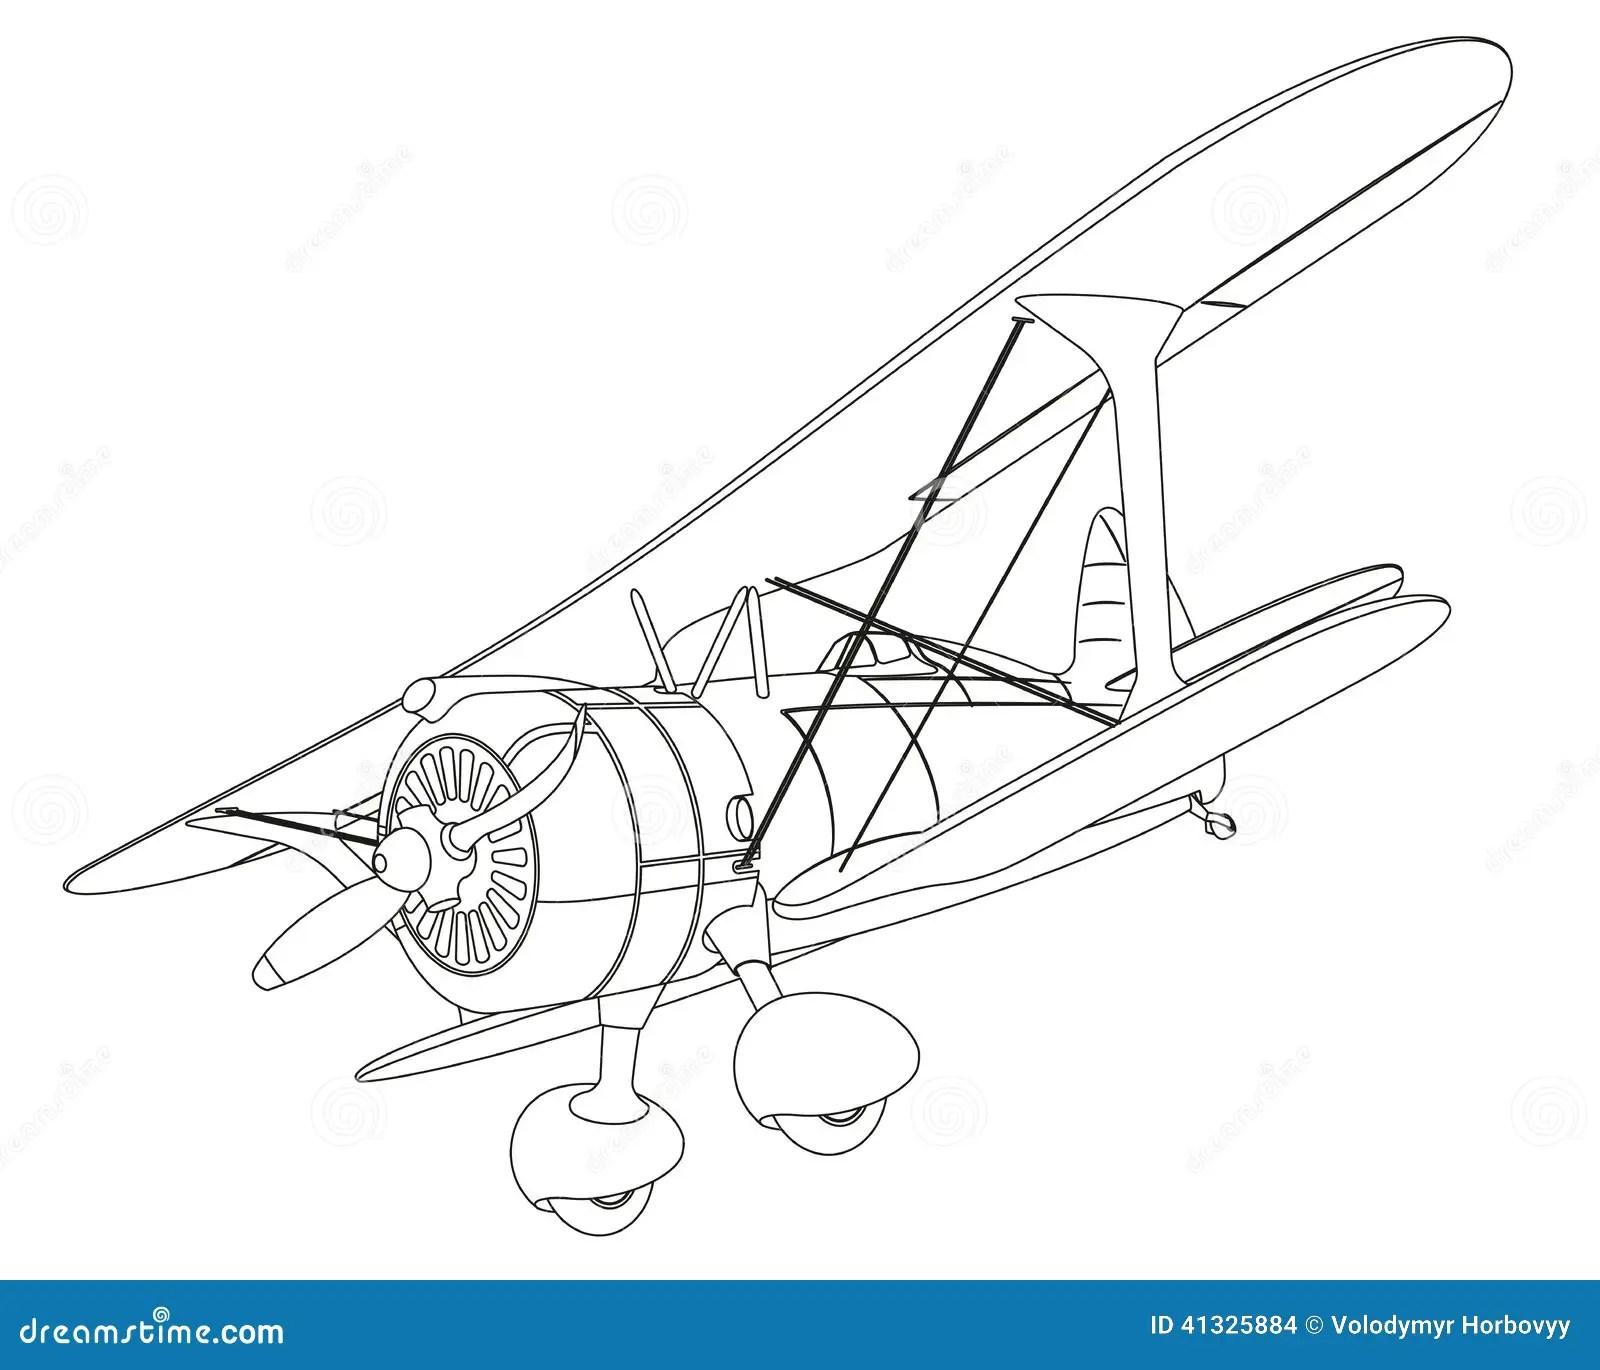 Small Private Airplane Vector Sketch Illustration Clip Art